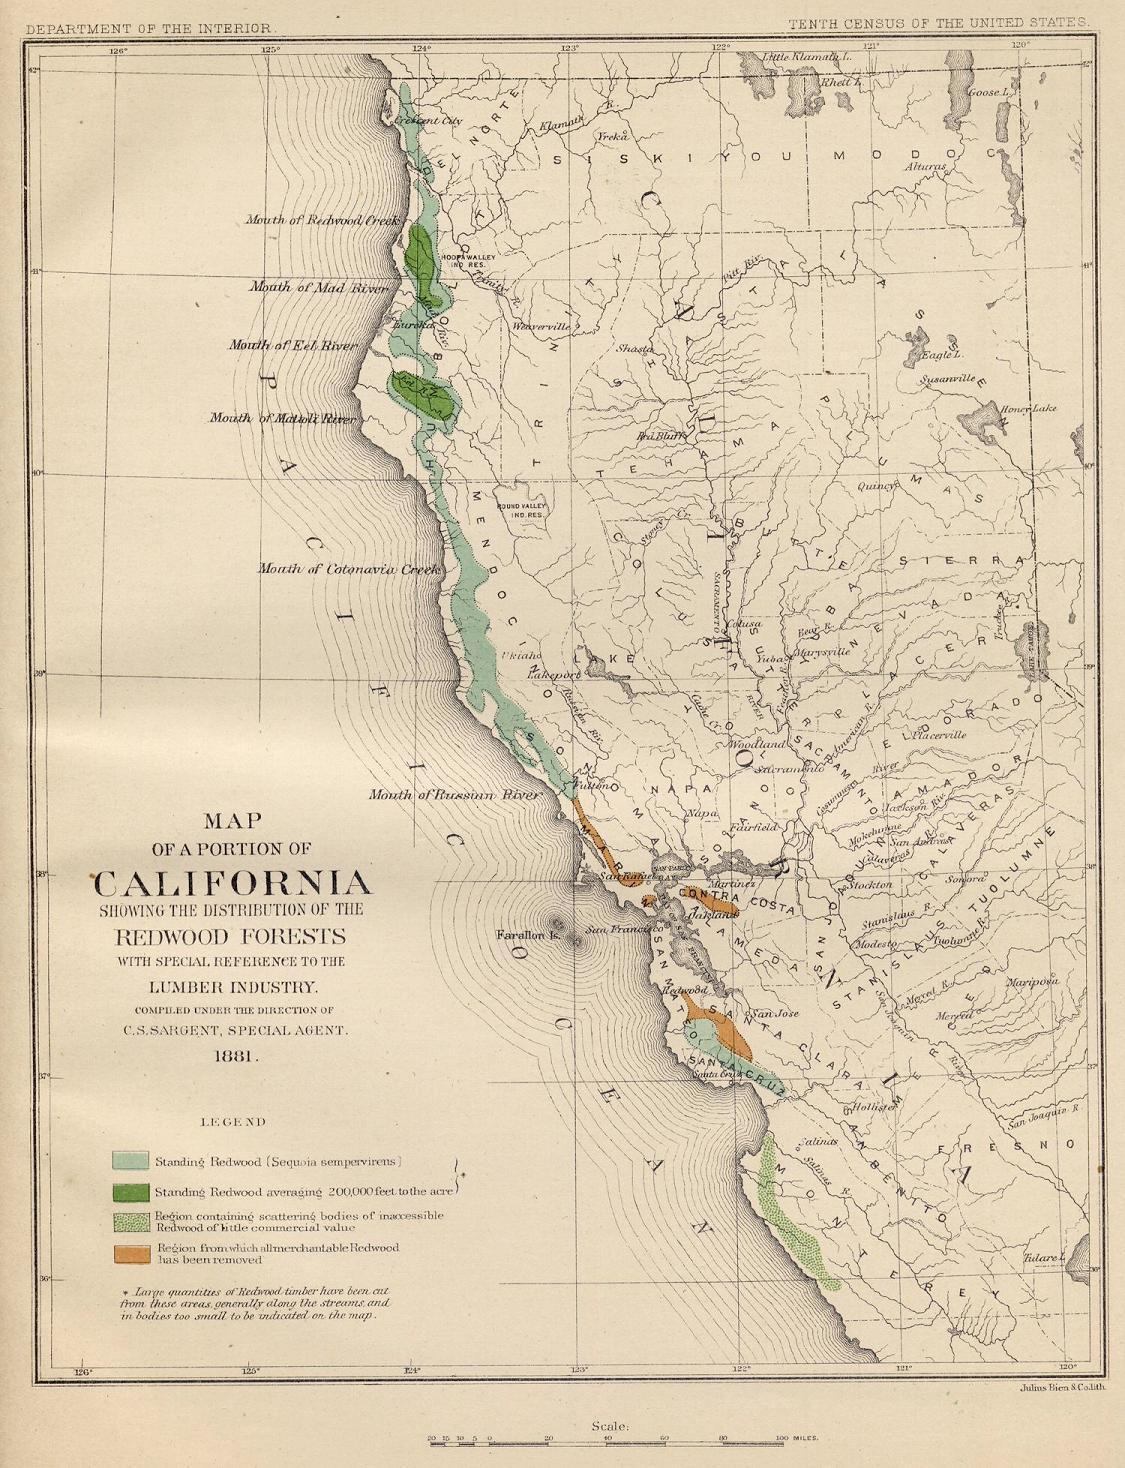 Coast Redwood Range and Biogeography on